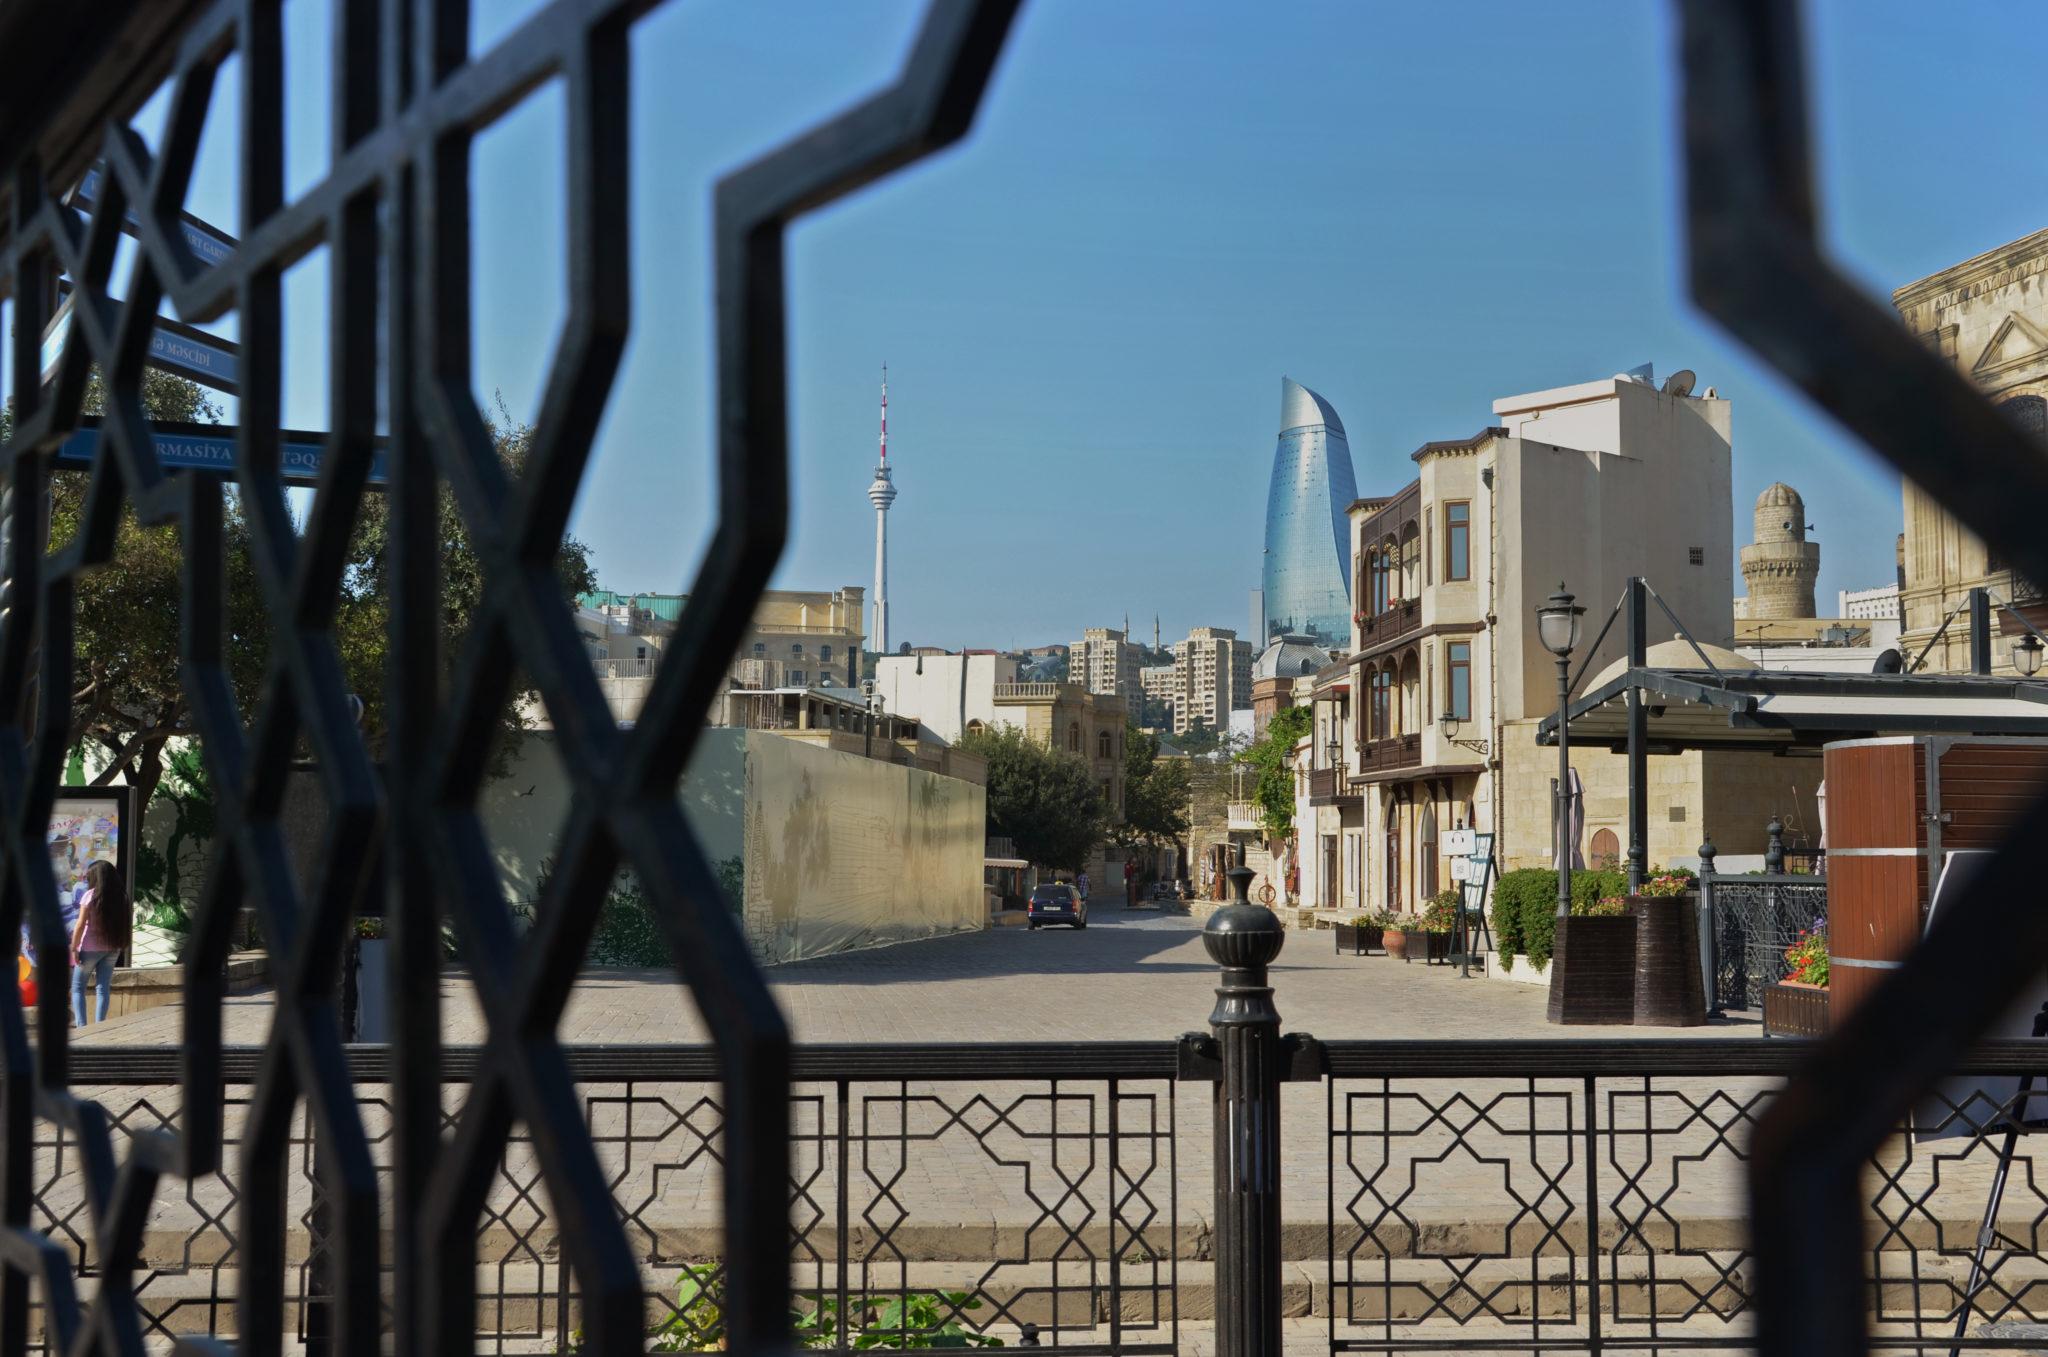 Baku-Azerbaijan-0ld-town